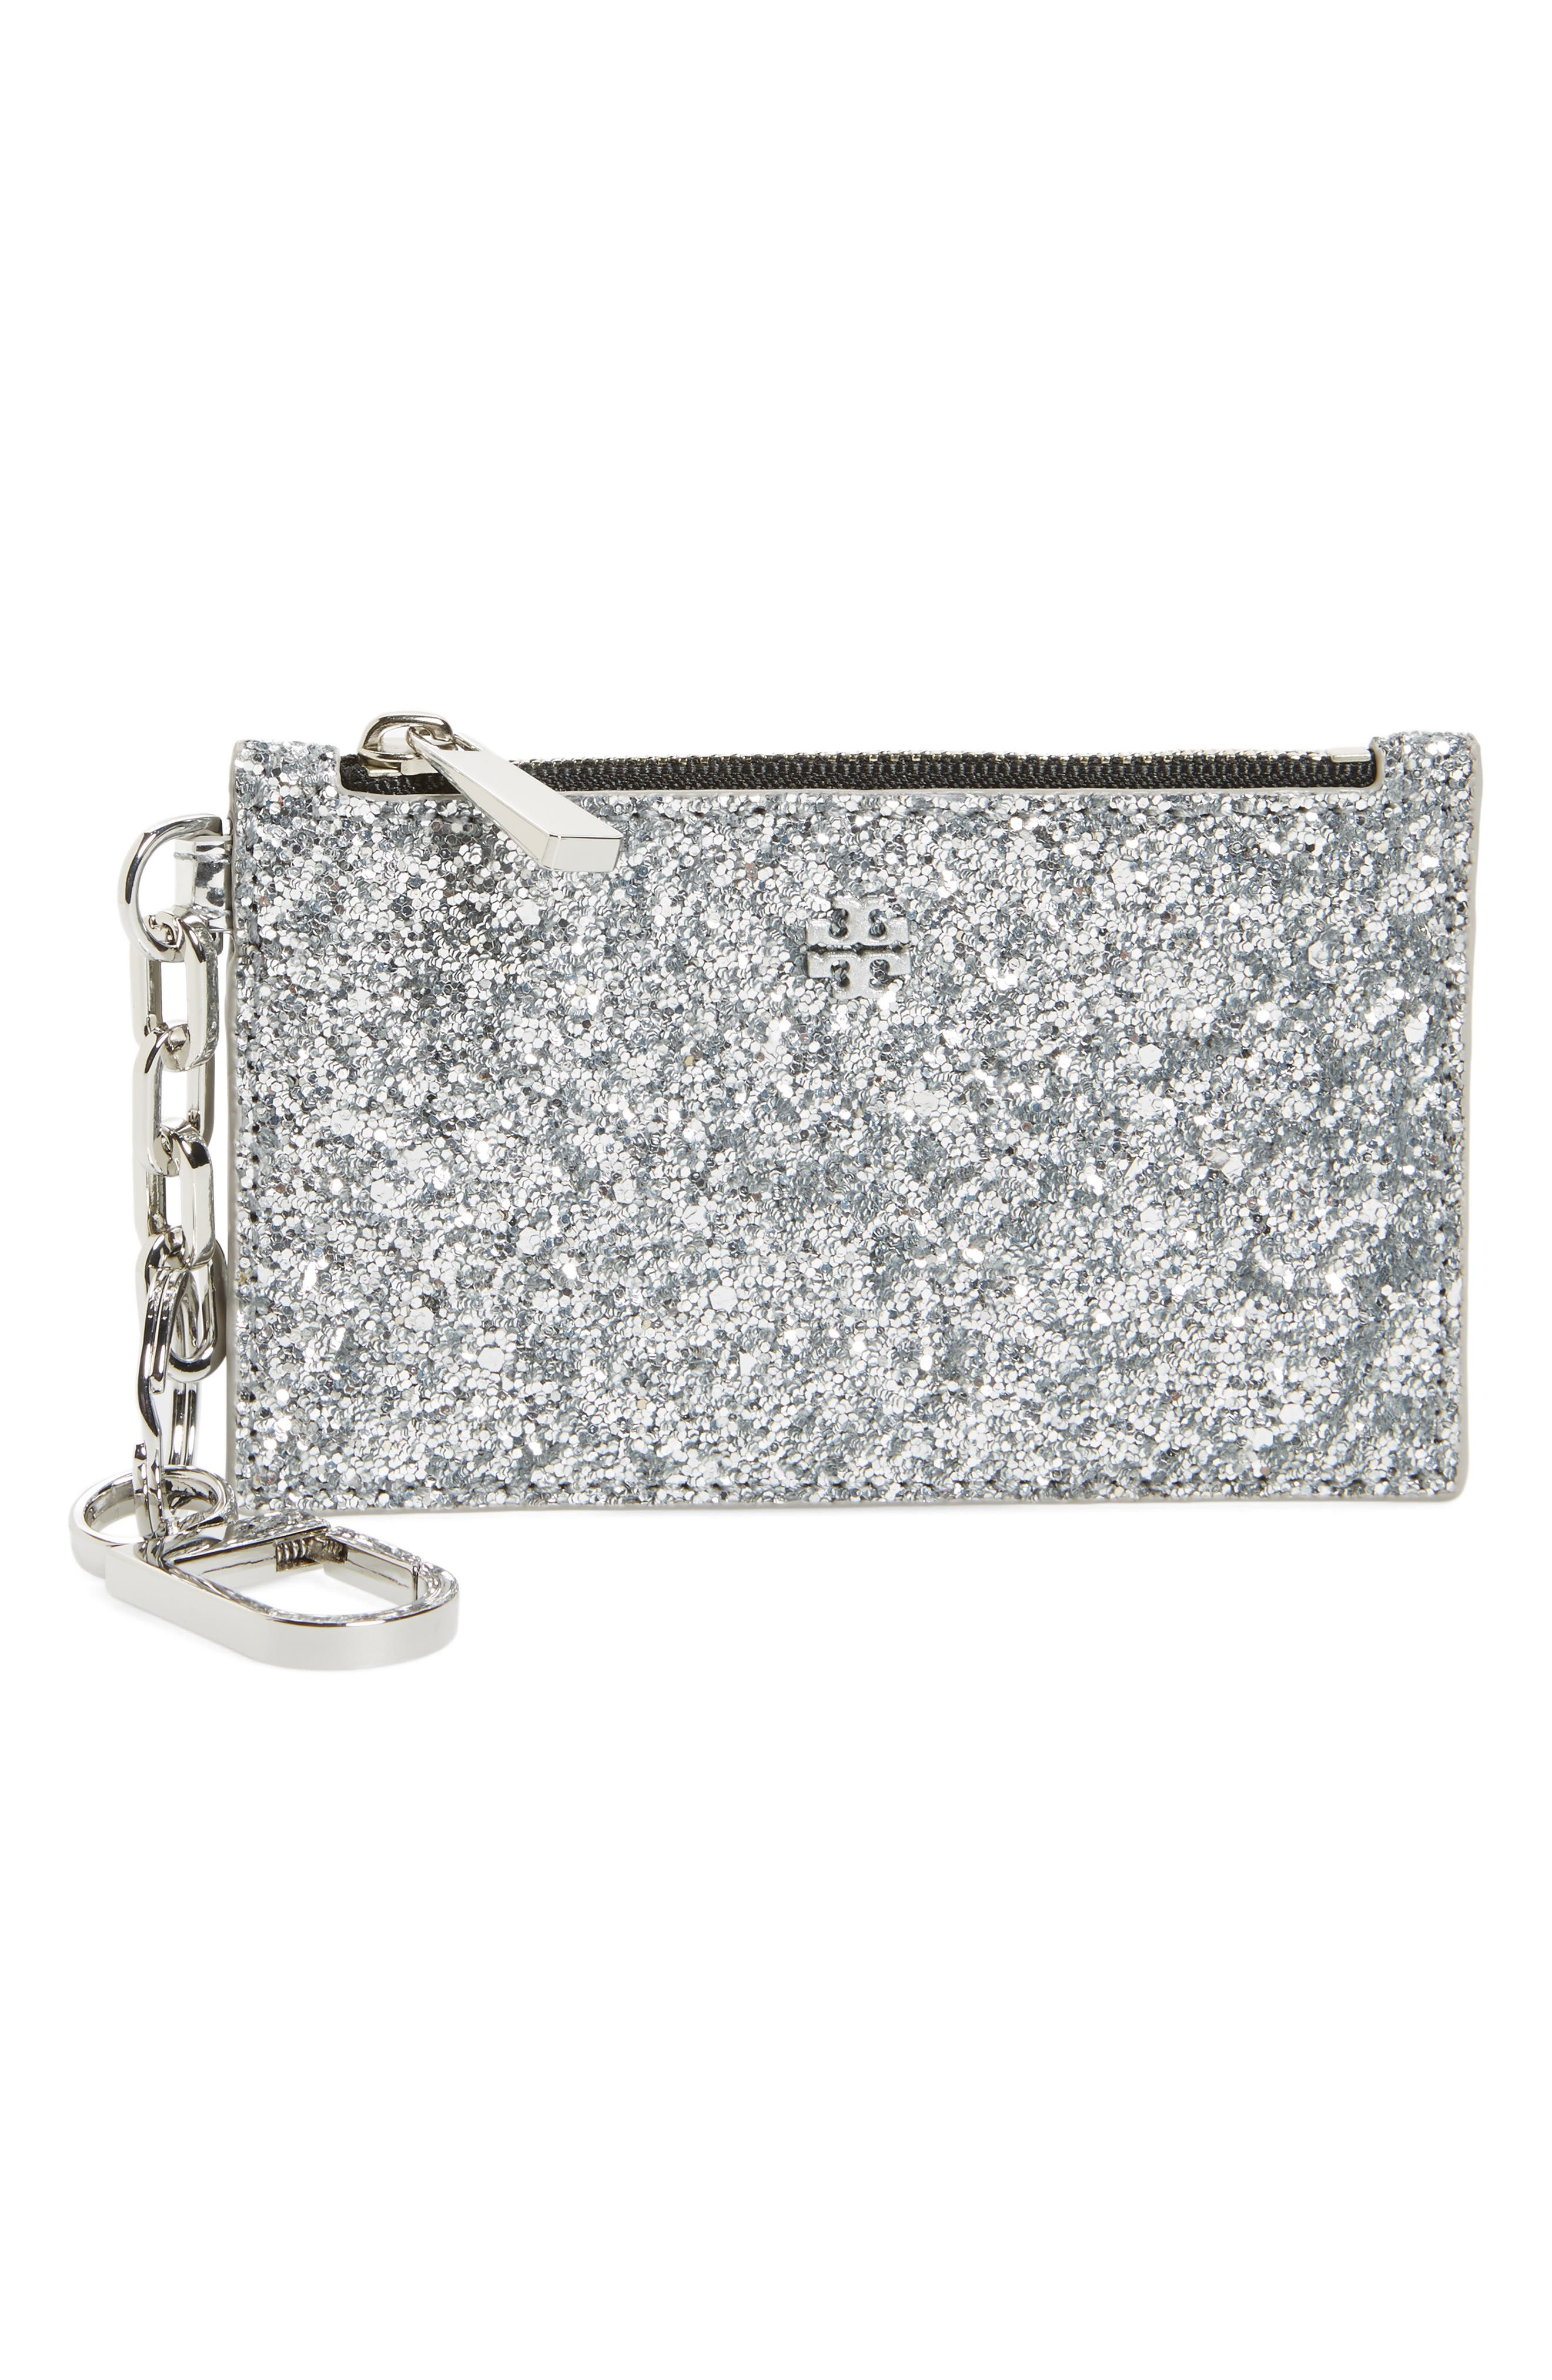 Robinson Glitter Card Case with Key Chain,                         Main,                         color, Silver Glitter